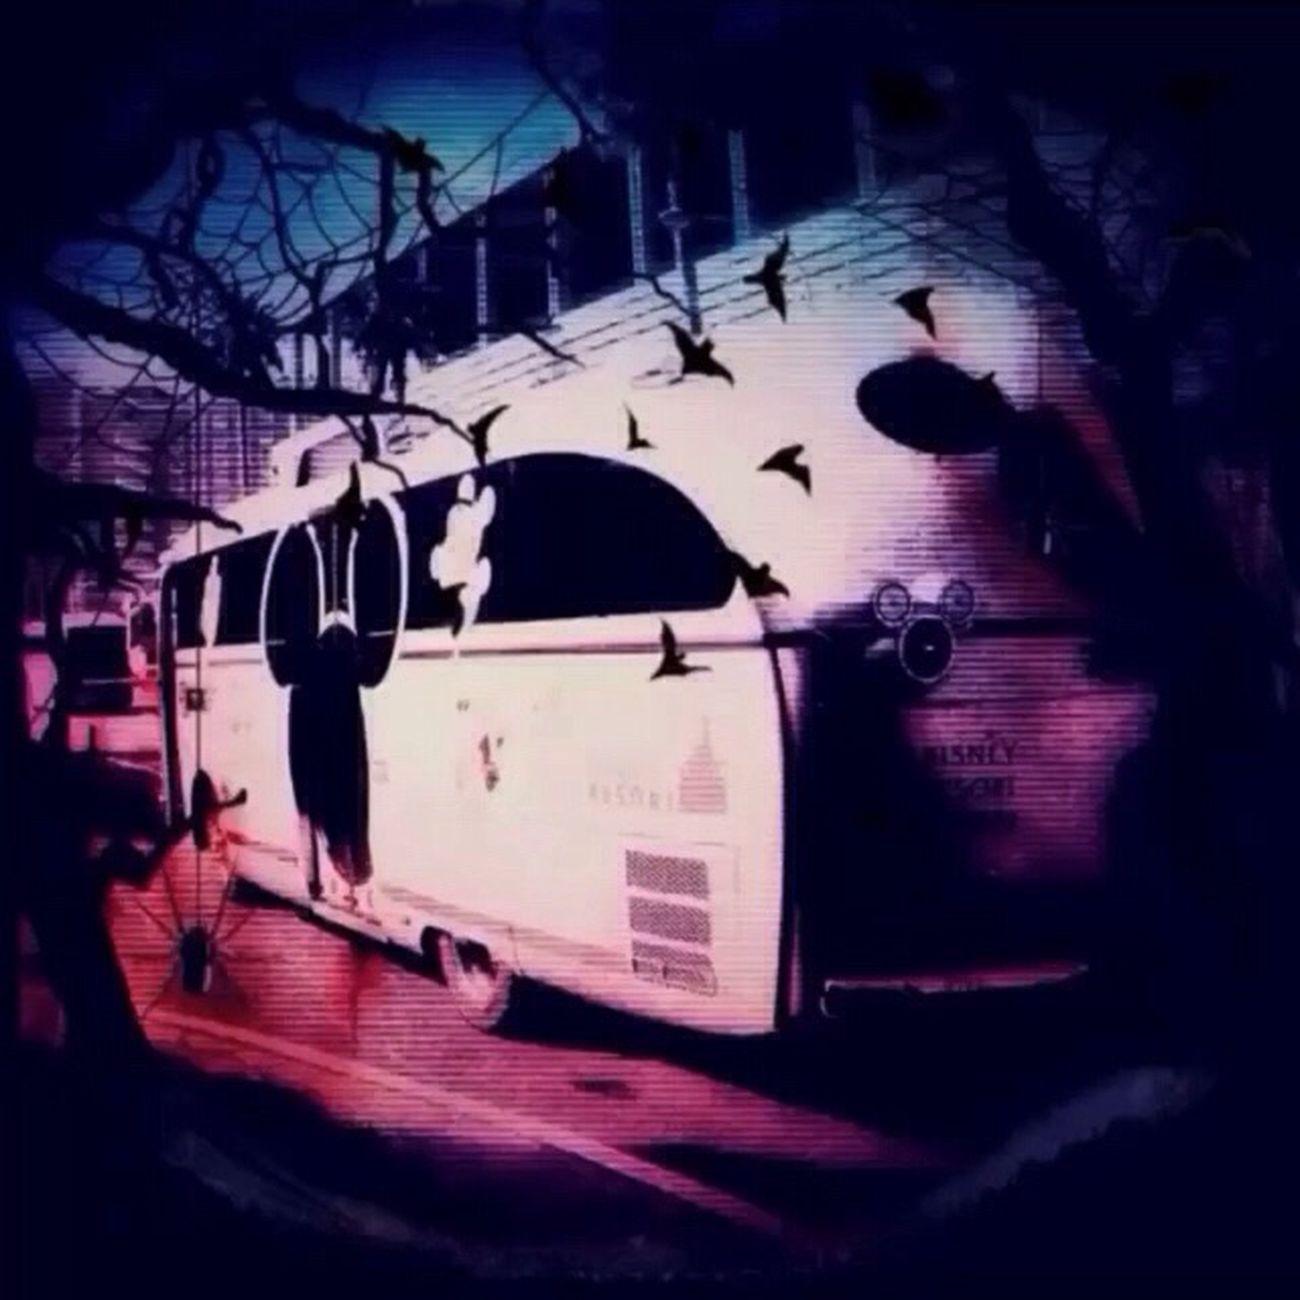 Disney Halloween Cinema Film MOVIE Timburton TheNightmareBeforeChristmas 🎶Danny Elfman - This Is Halloween